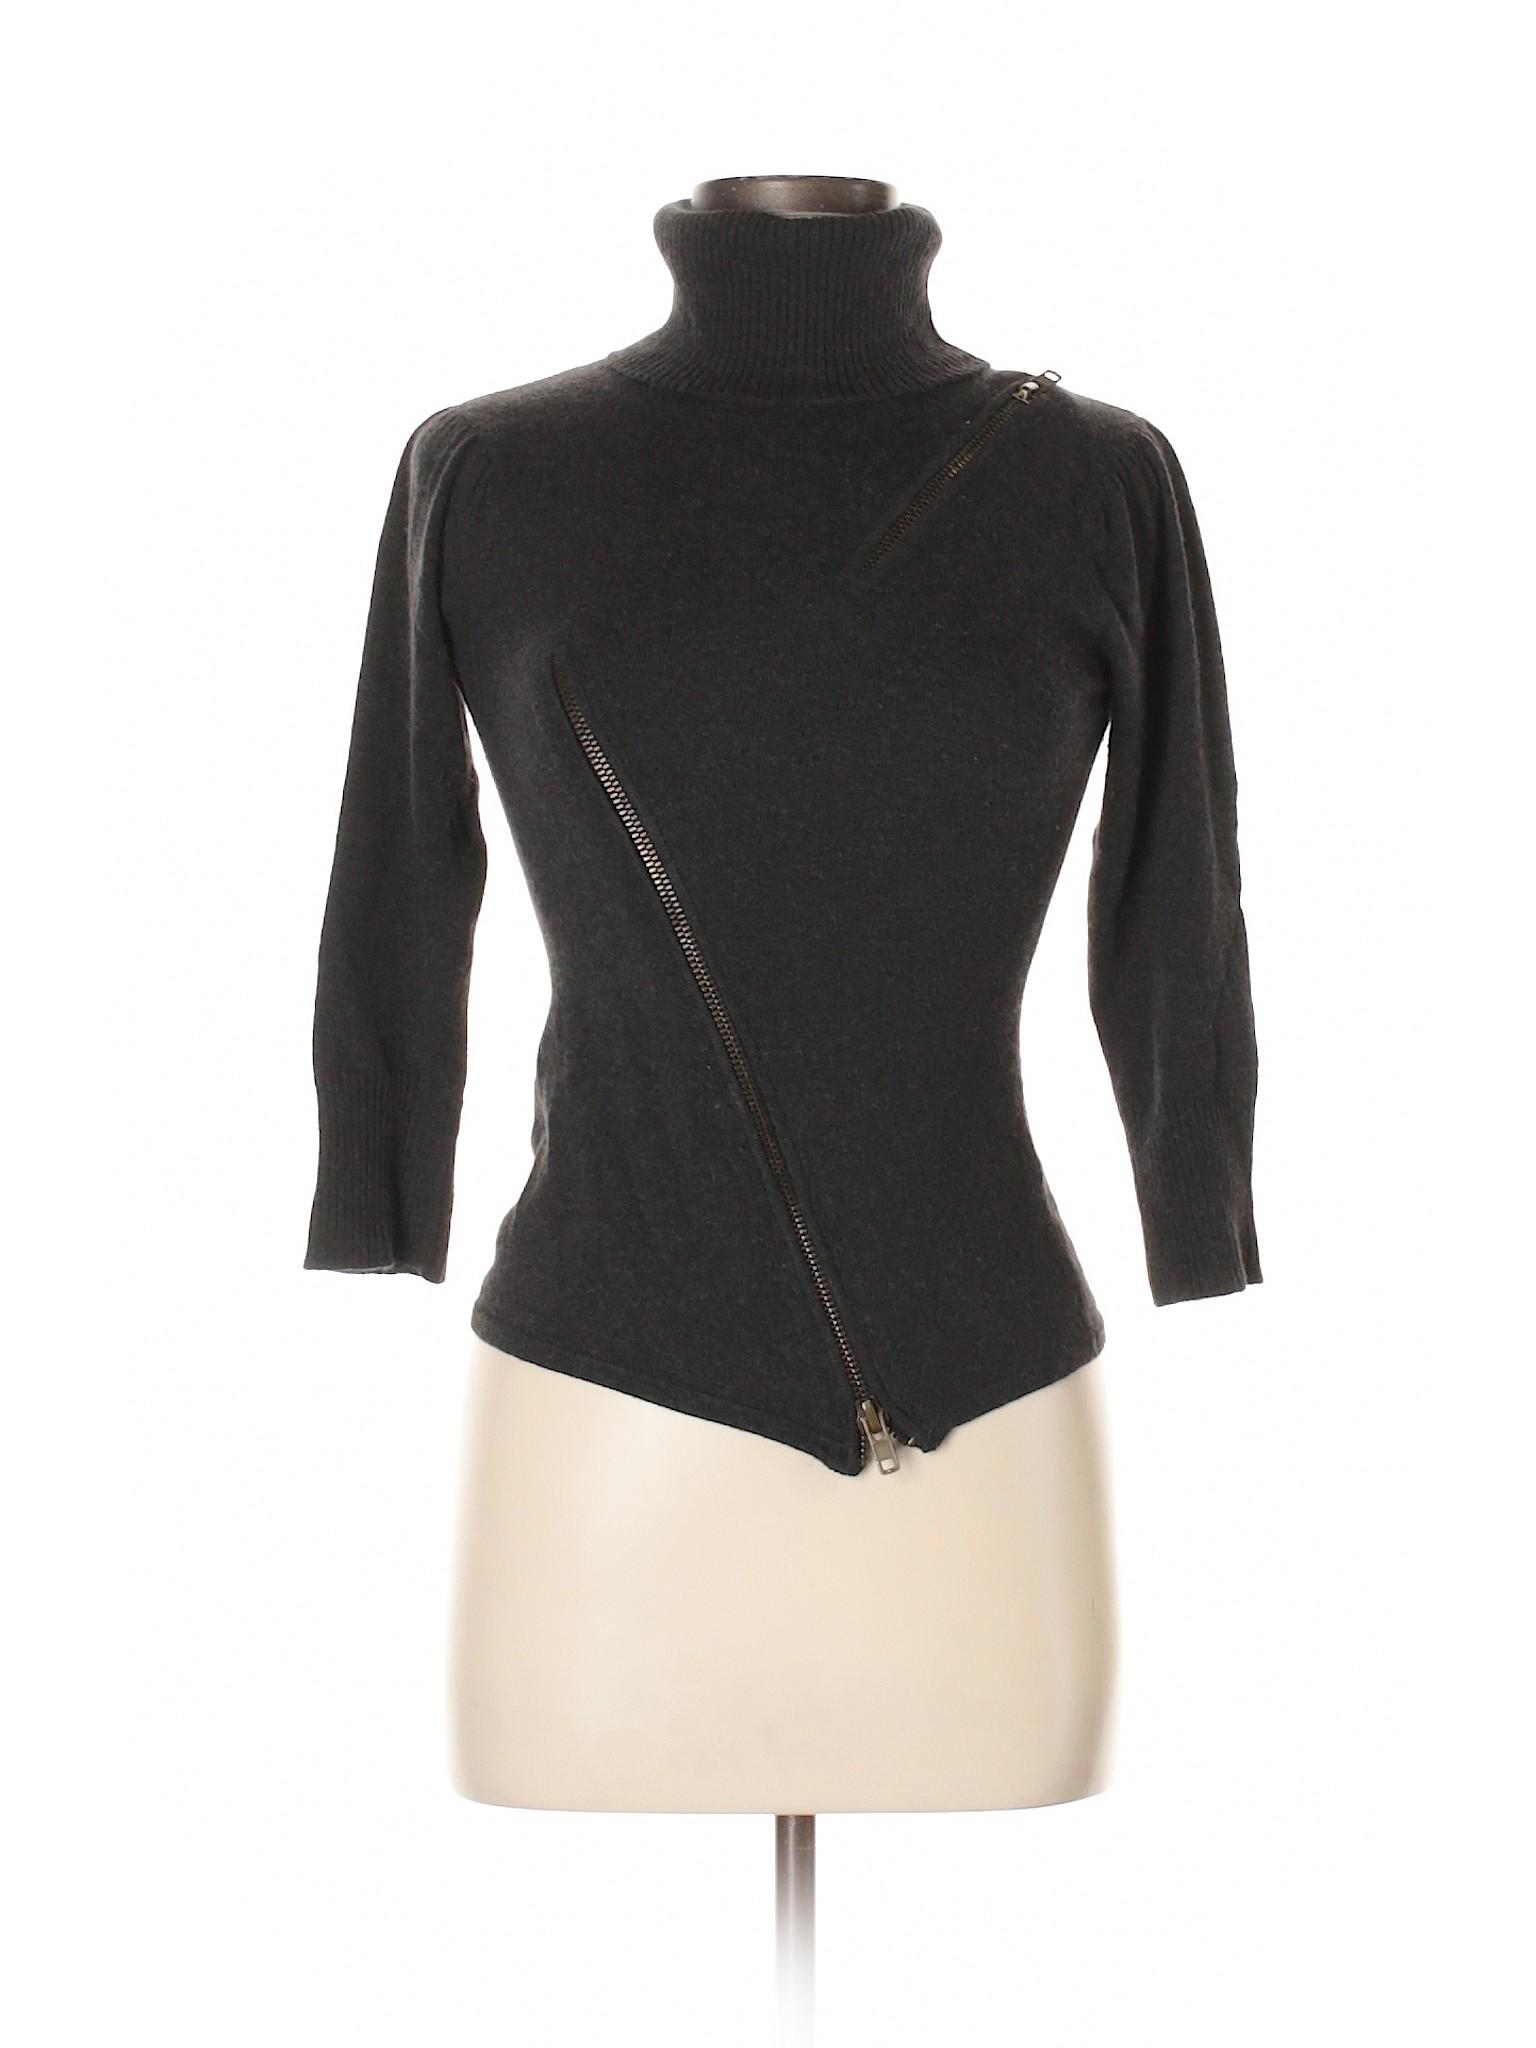 Boutique Turtleneck Sweater Malandrino Boutique Catherine Catherine Malandrino Rqwnp1W8B